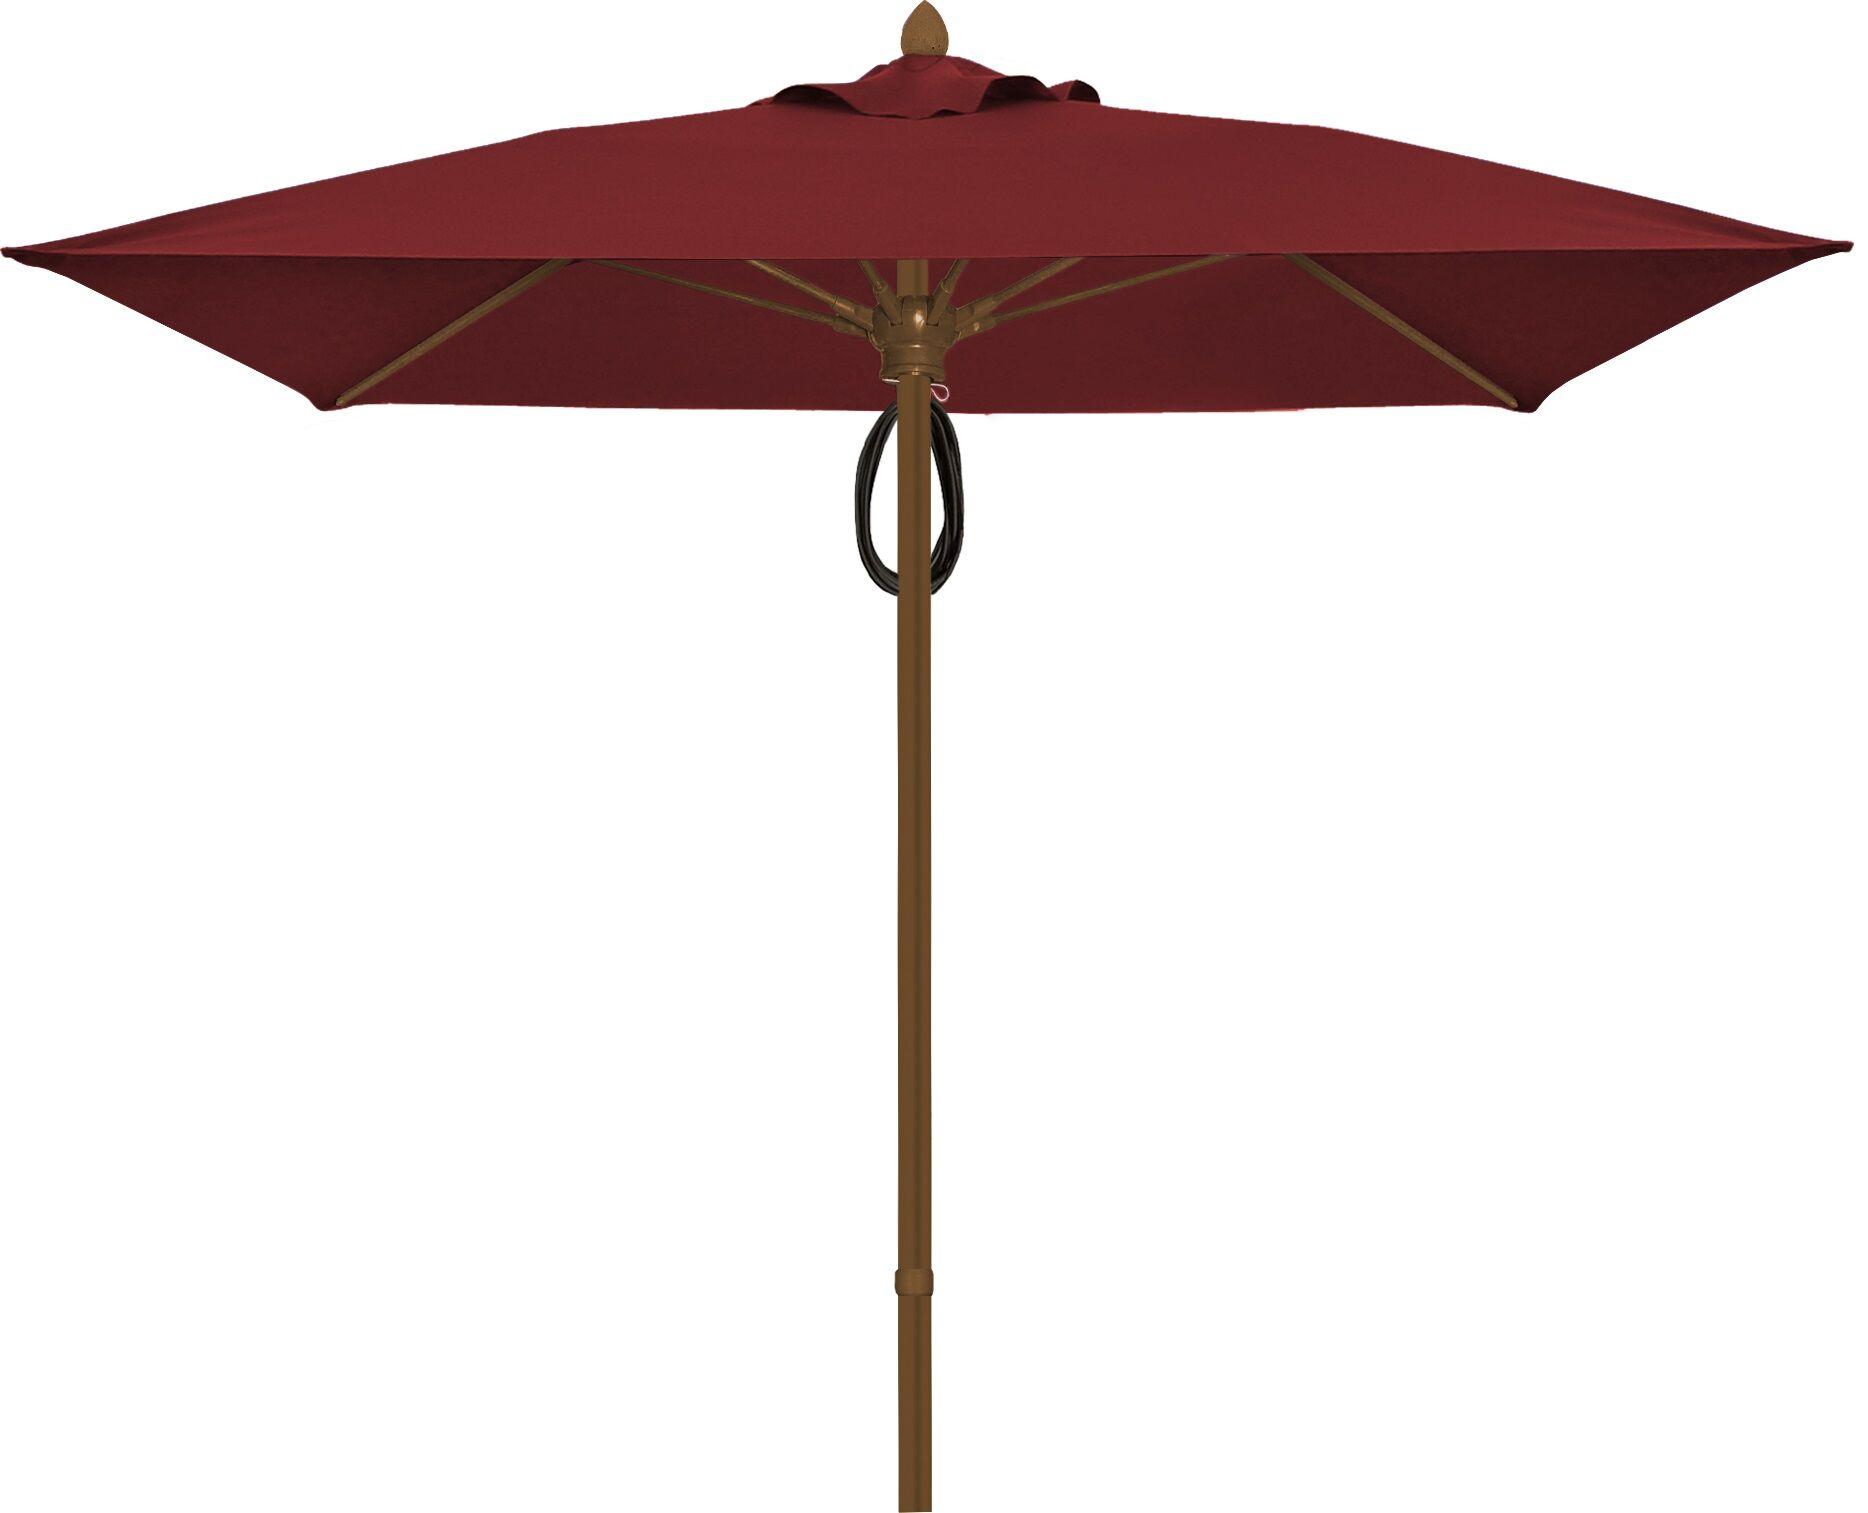 Prestige 7.5' Square Market Umbrella Frame Finish: White, Fabric: Burgundy